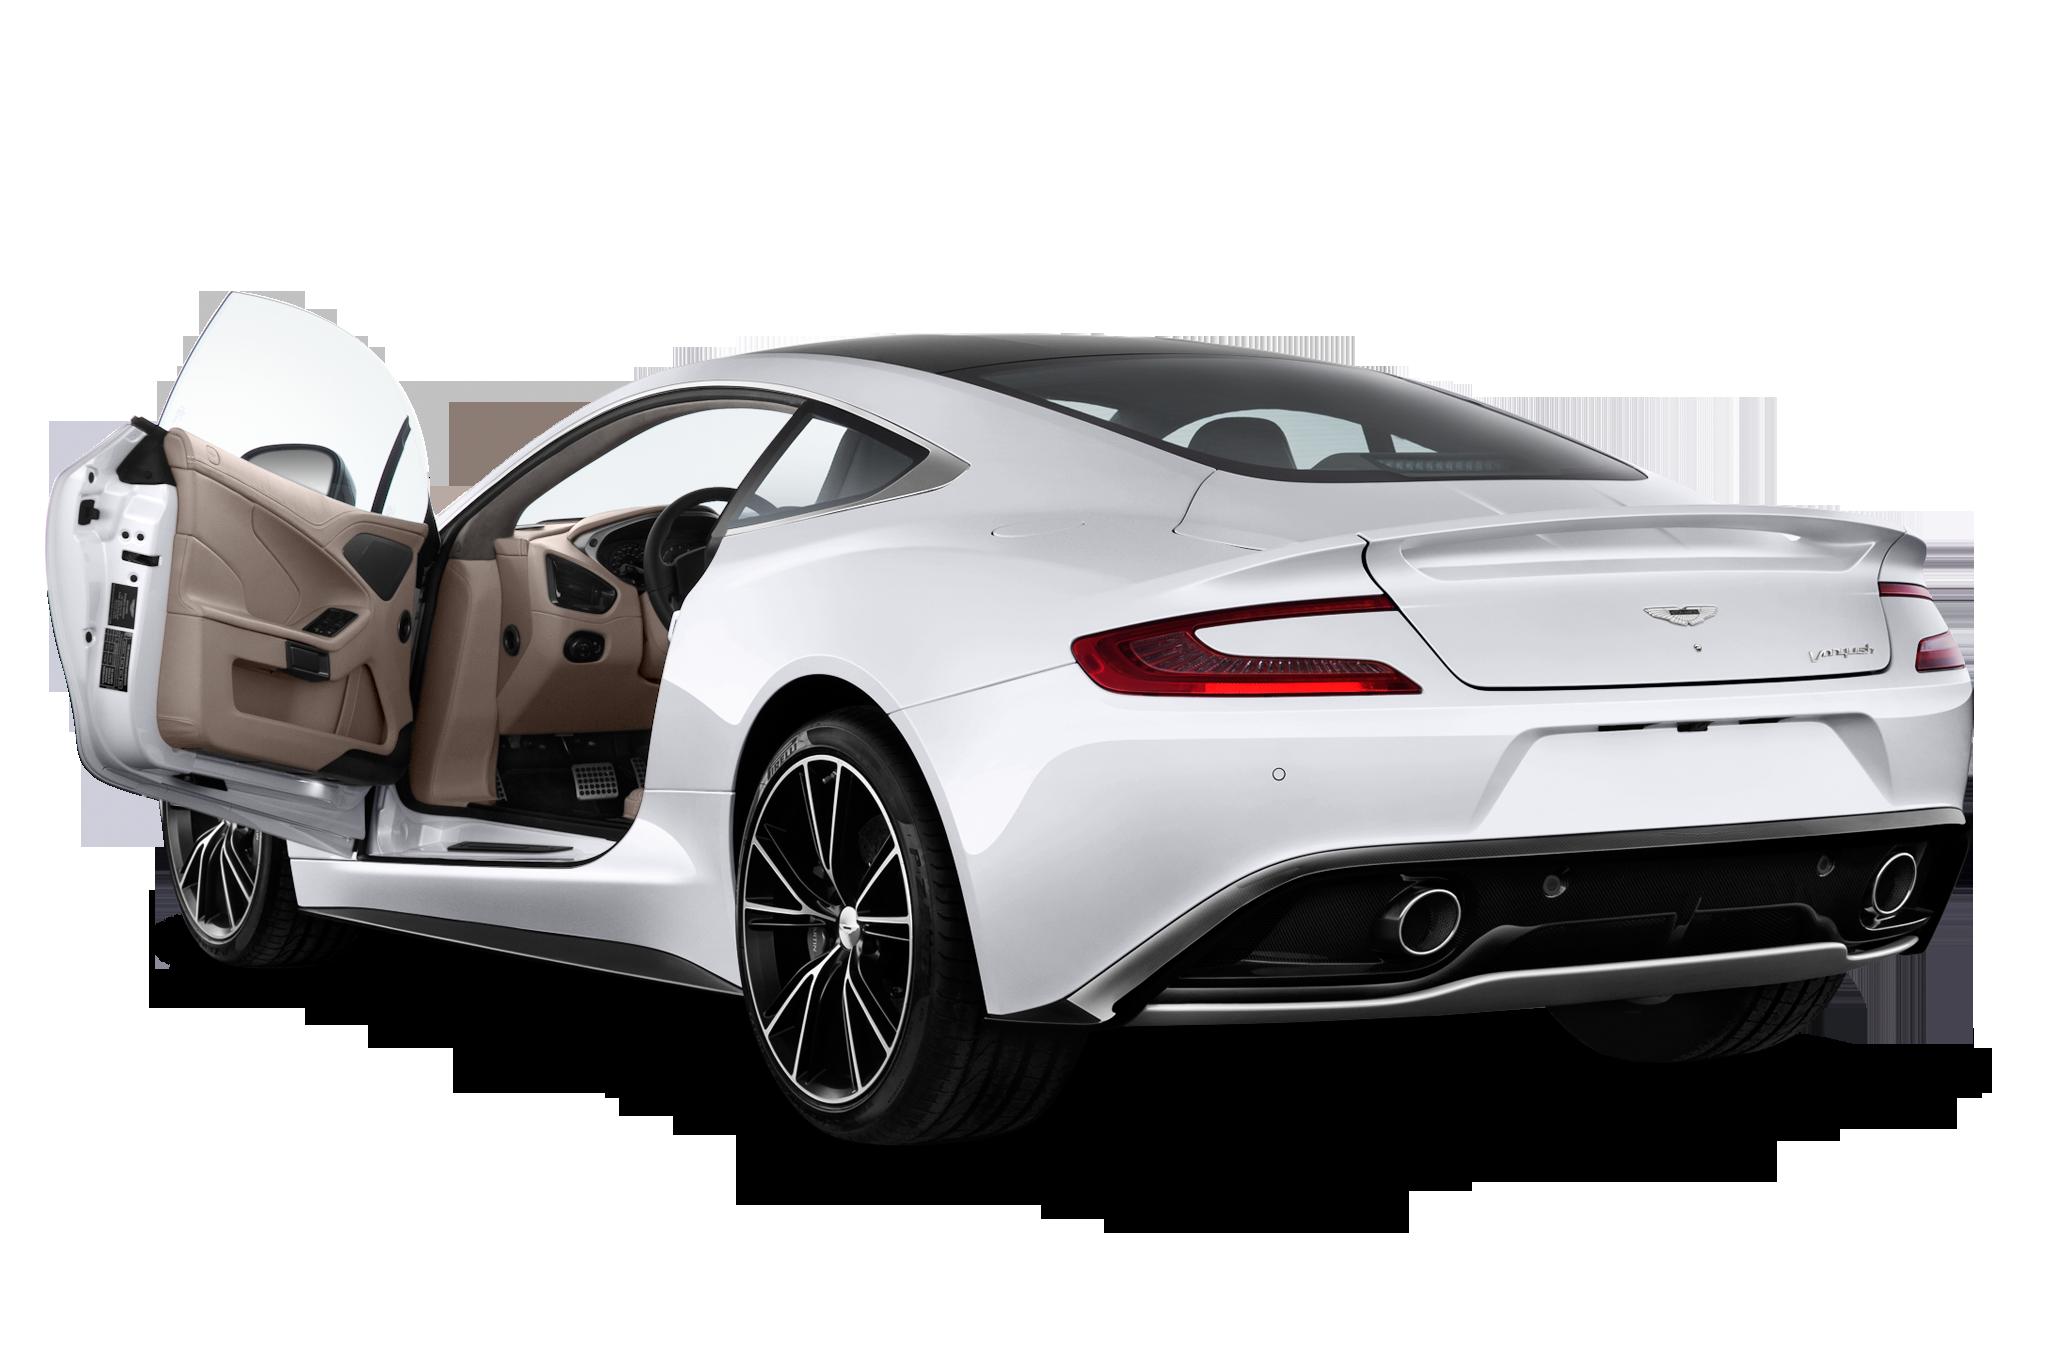 Aston Martin Vanquish Zagato Confirmed For Production